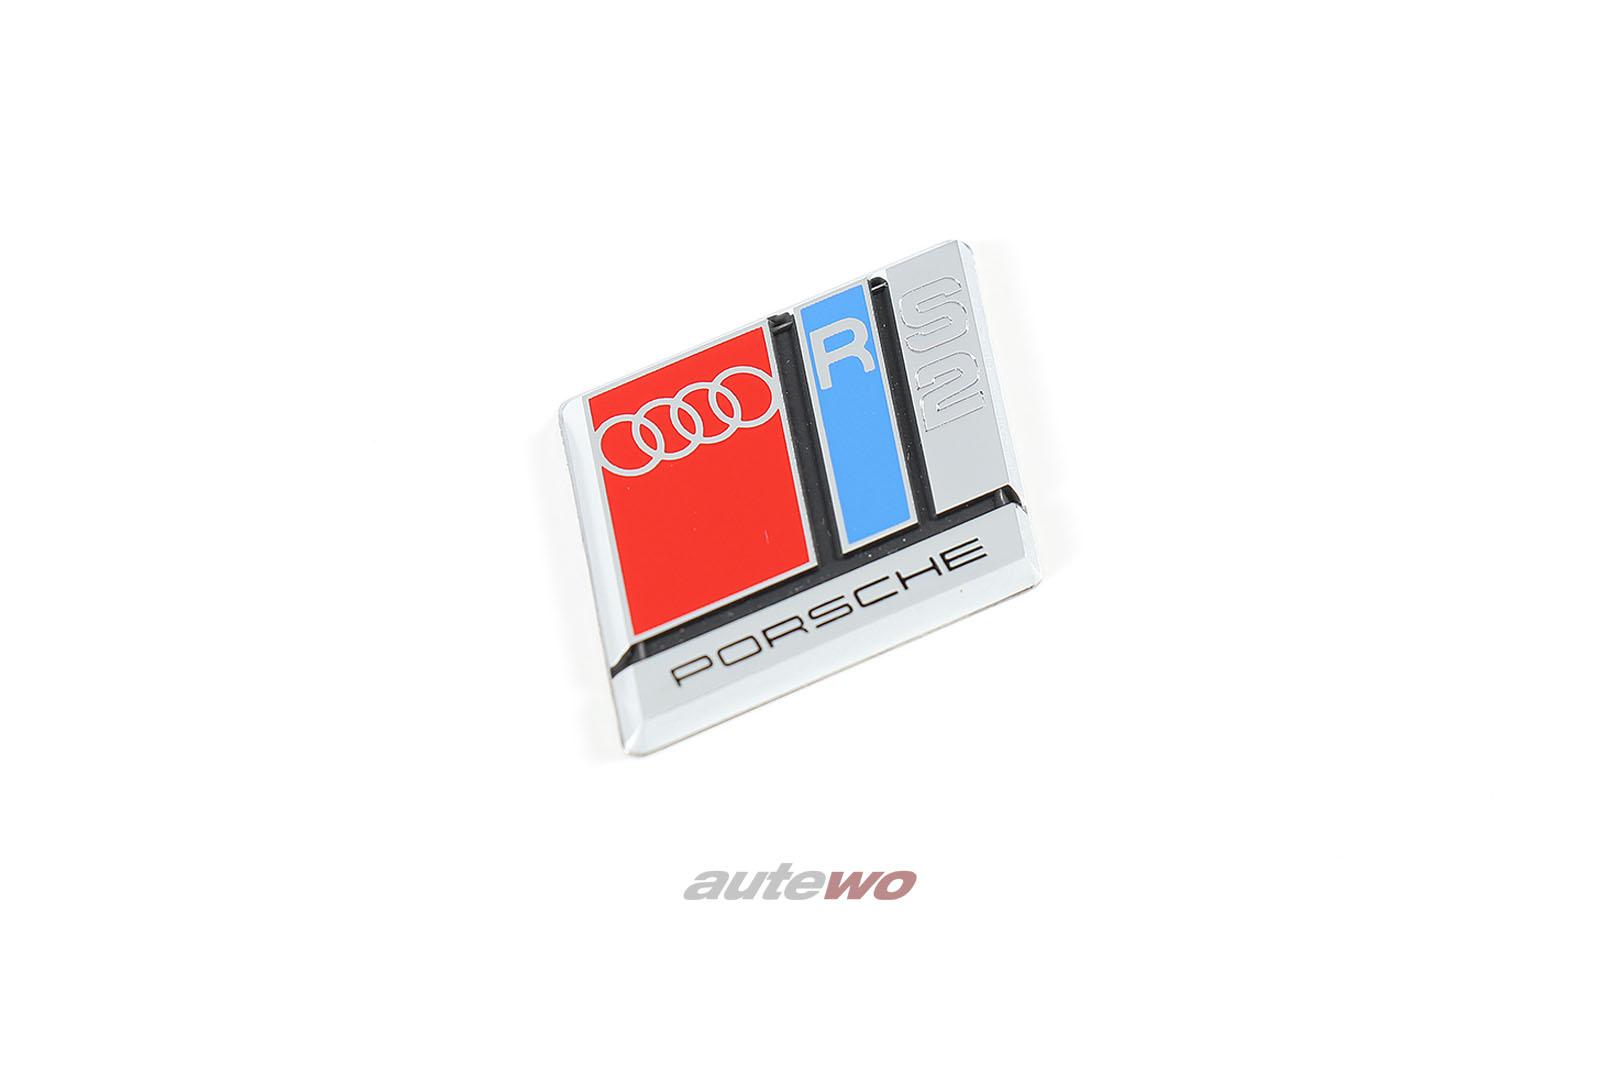 8A0419685C NEU Audi RS2 P1 Plakette/Emblem 3-Speichen-Airbag-Sport-Lenkrad